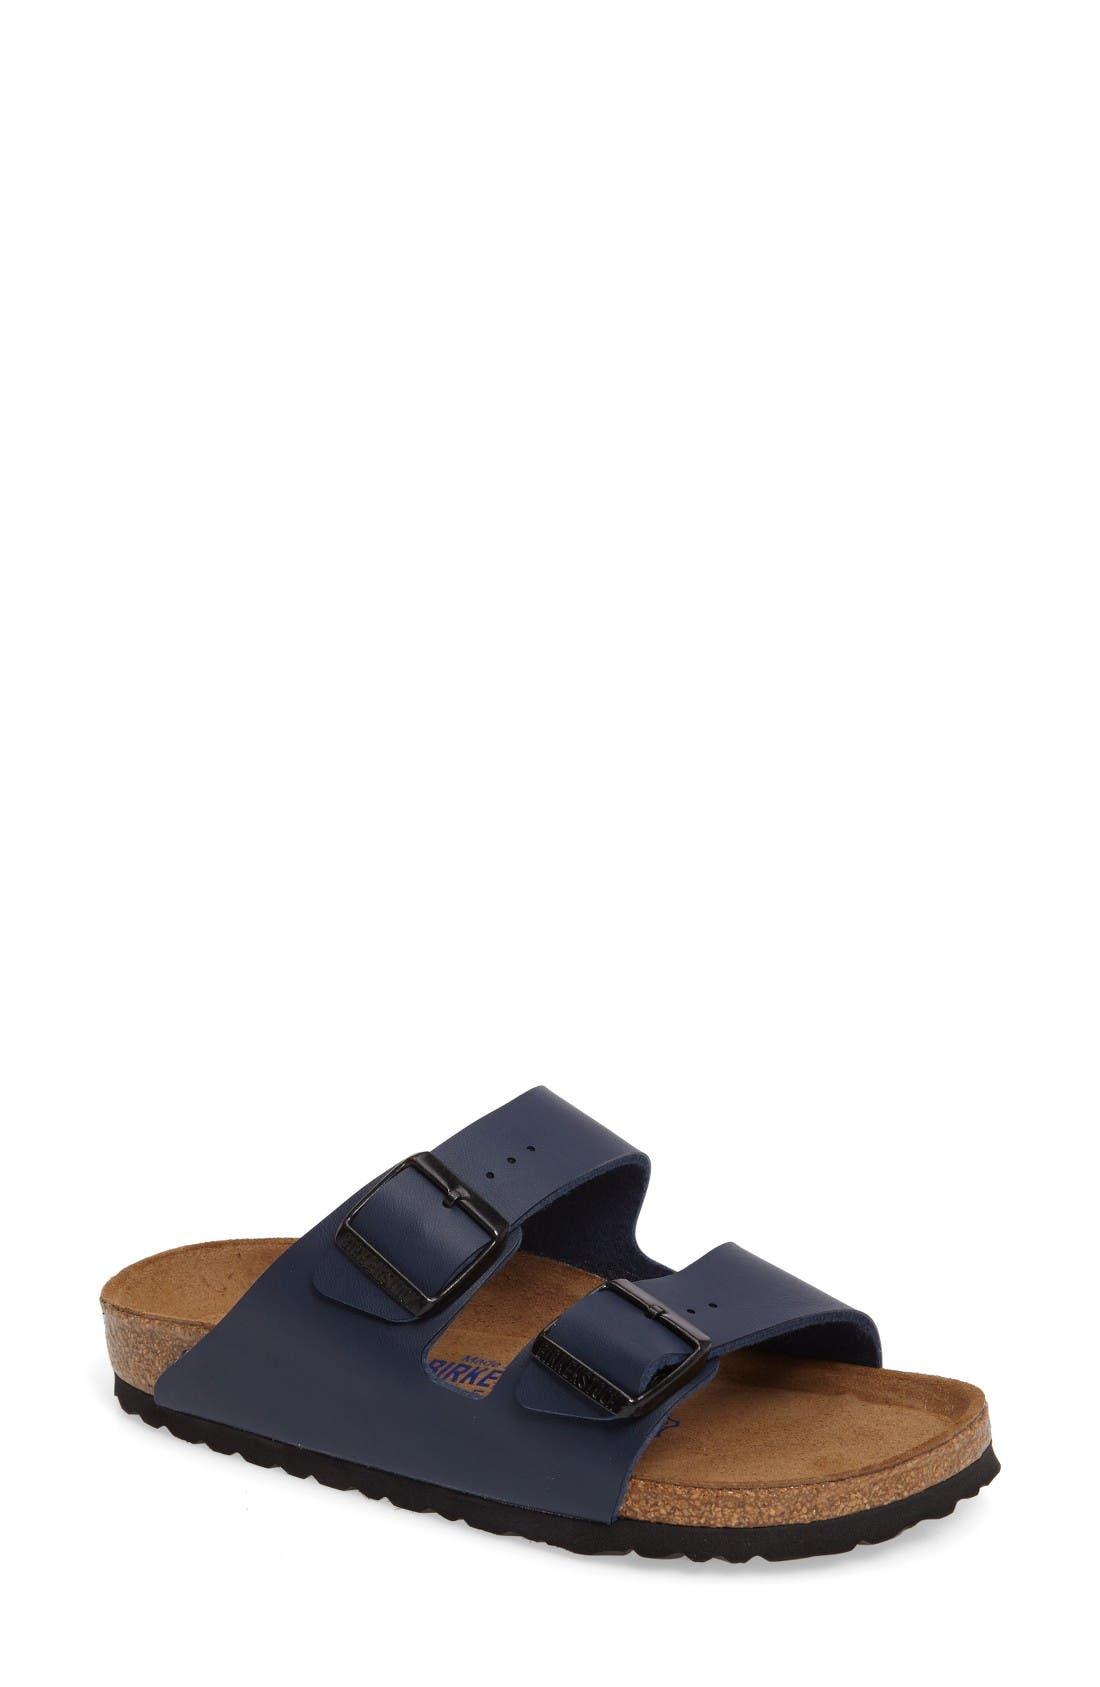 6626815e4b13 Birkenstock Sandals